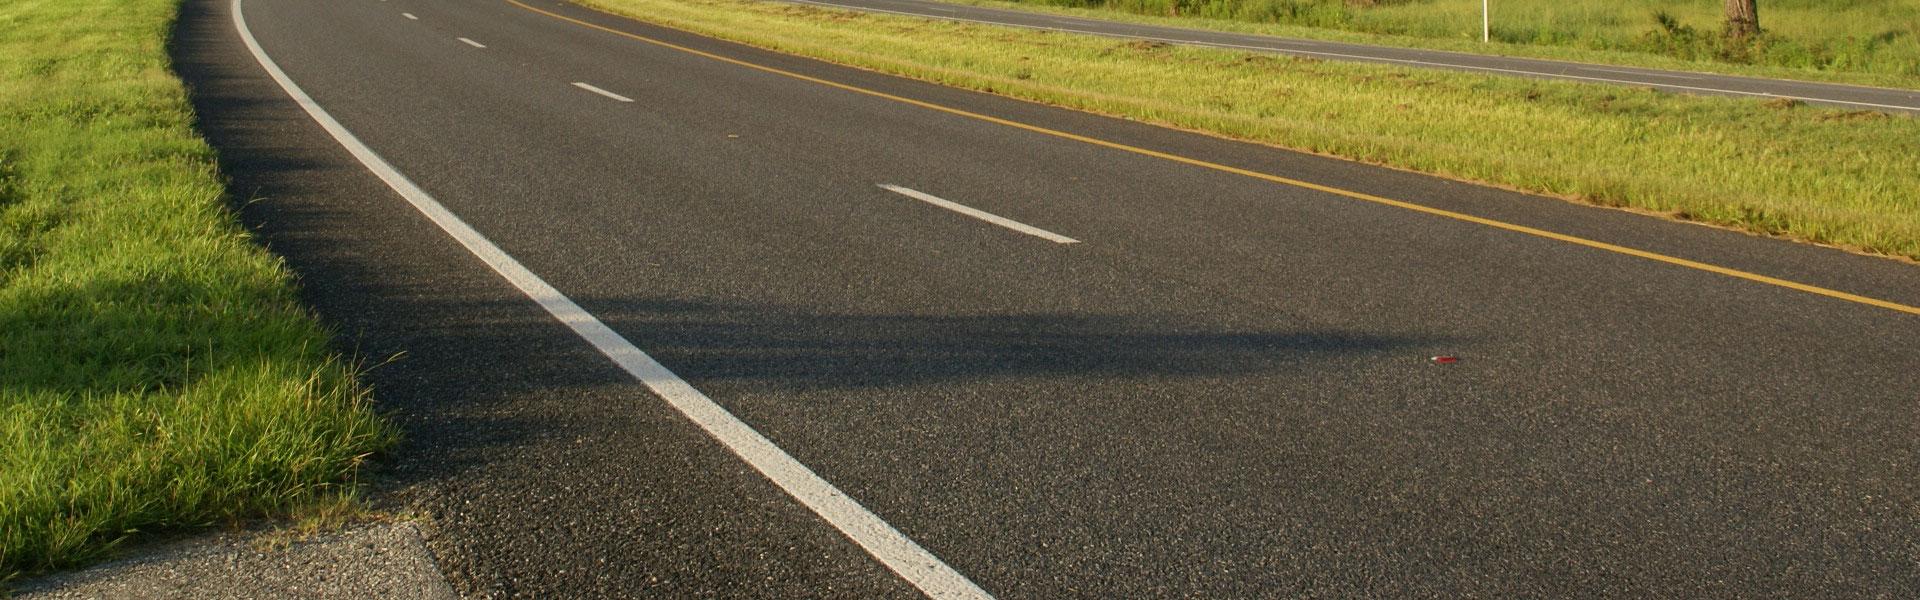 SKYHAWK Increases Driver Accountability